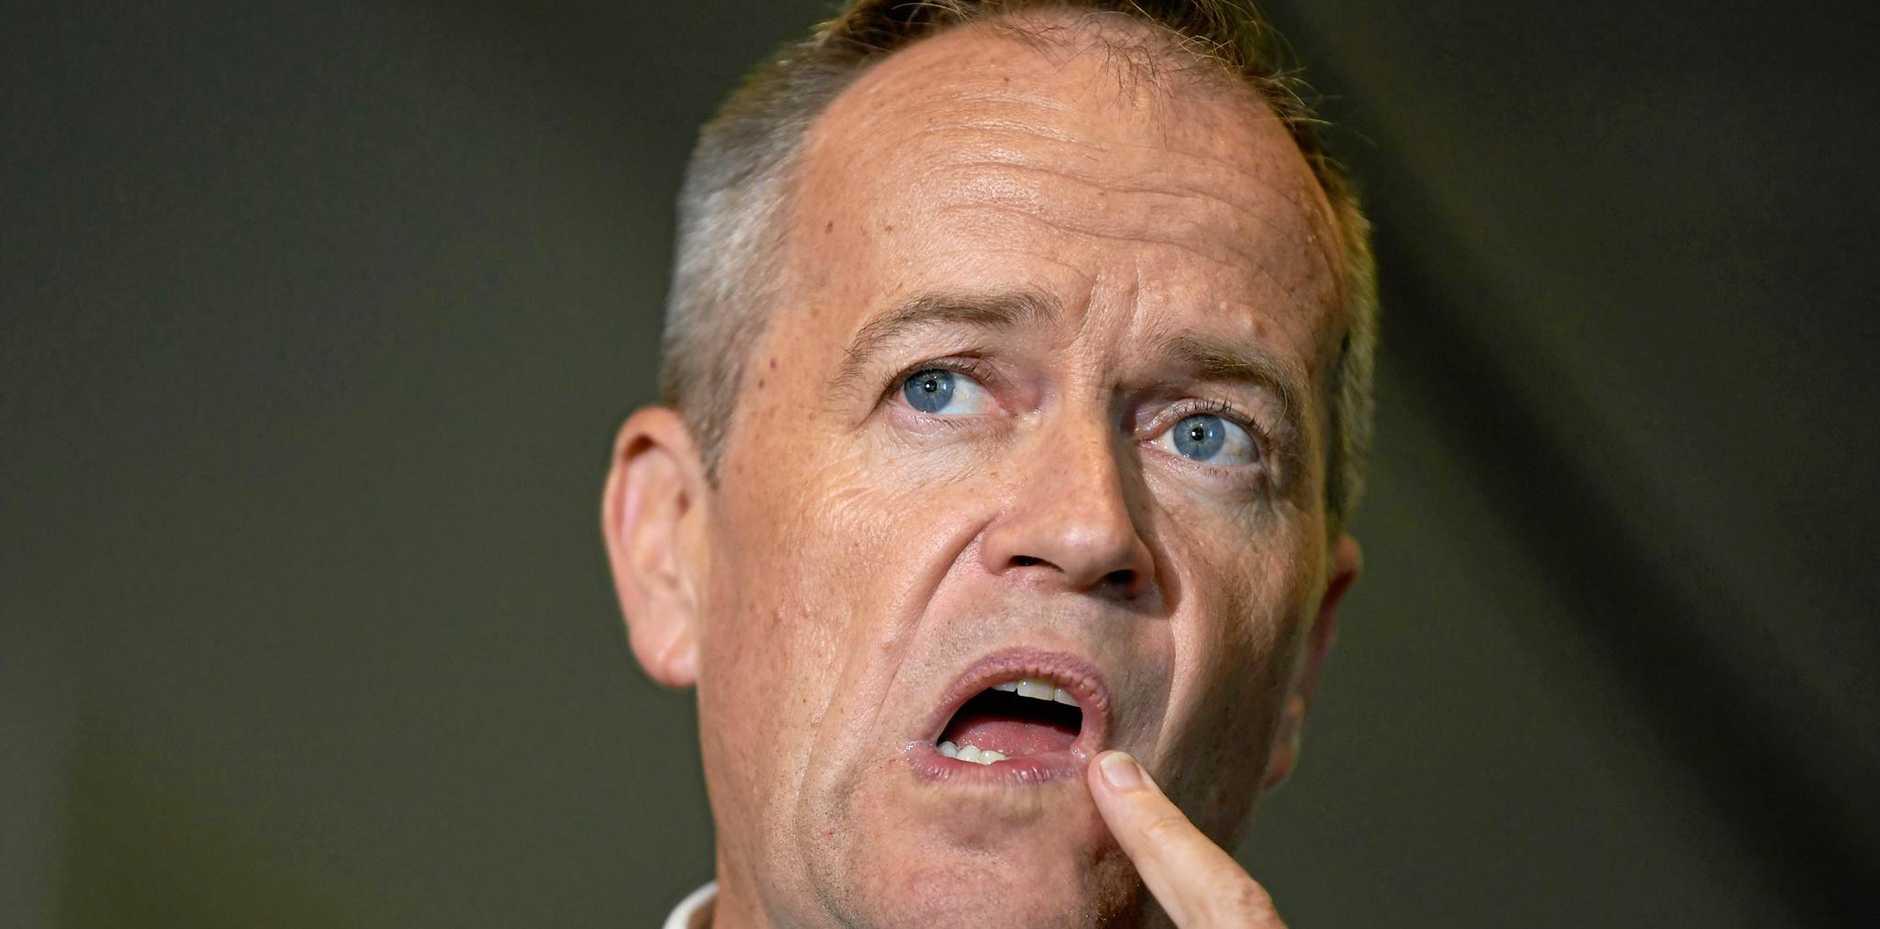 Australia's Opposition Leader Bill Shorten